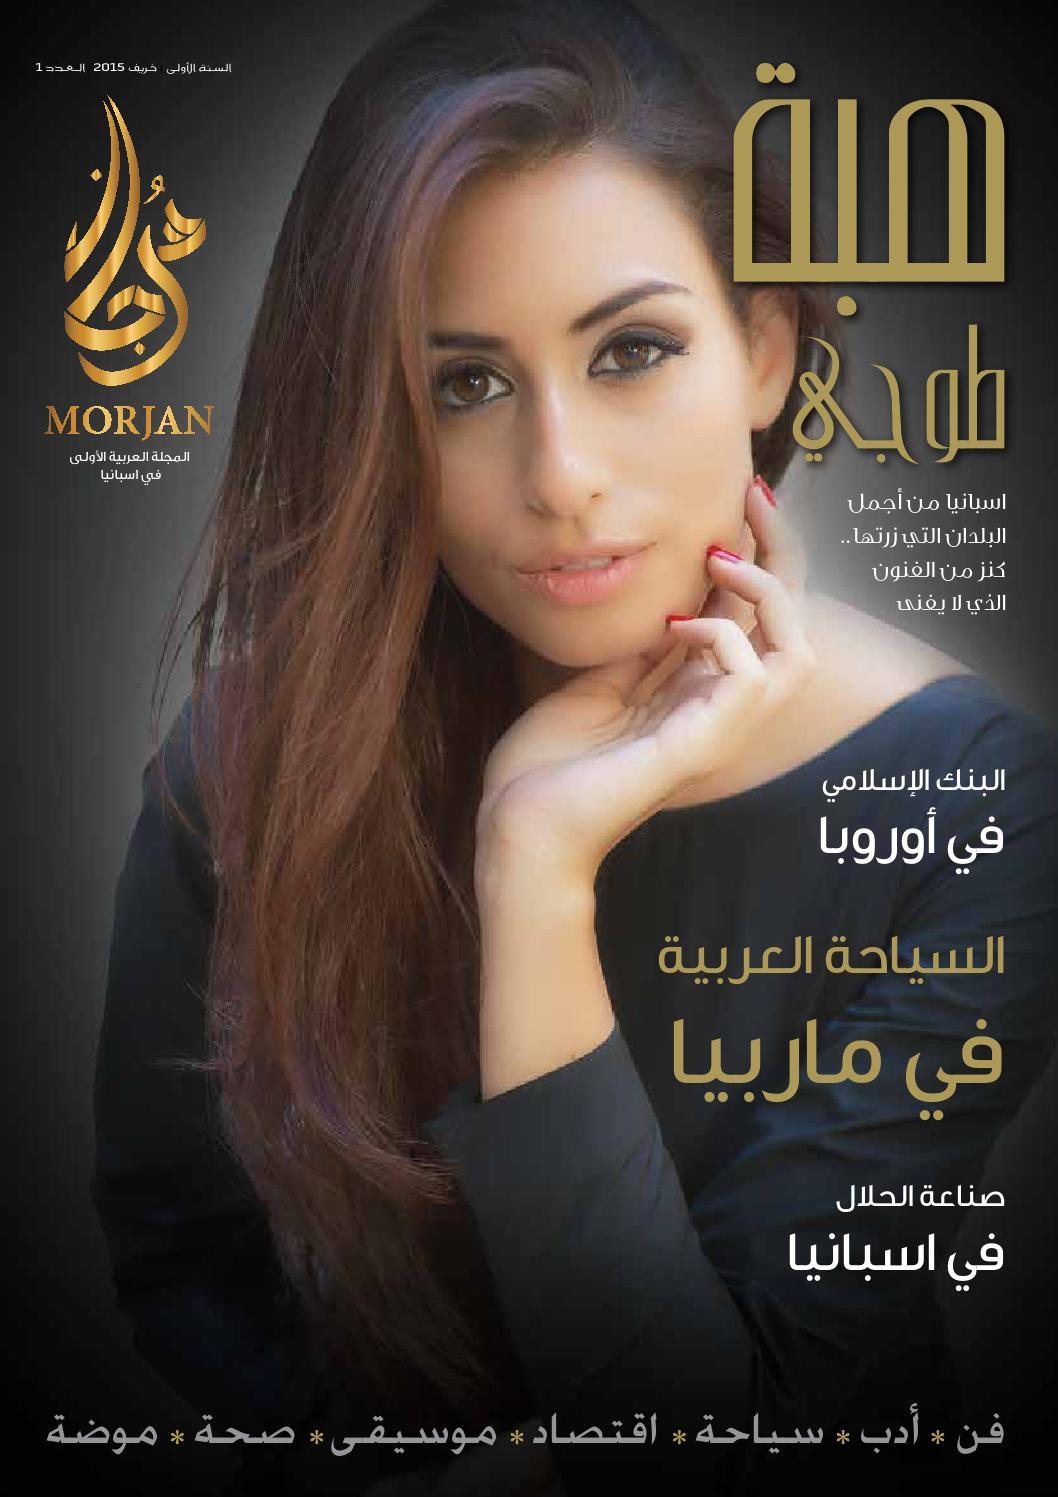 87b8d63d7 Morjan Número 1 by morjan - issuu